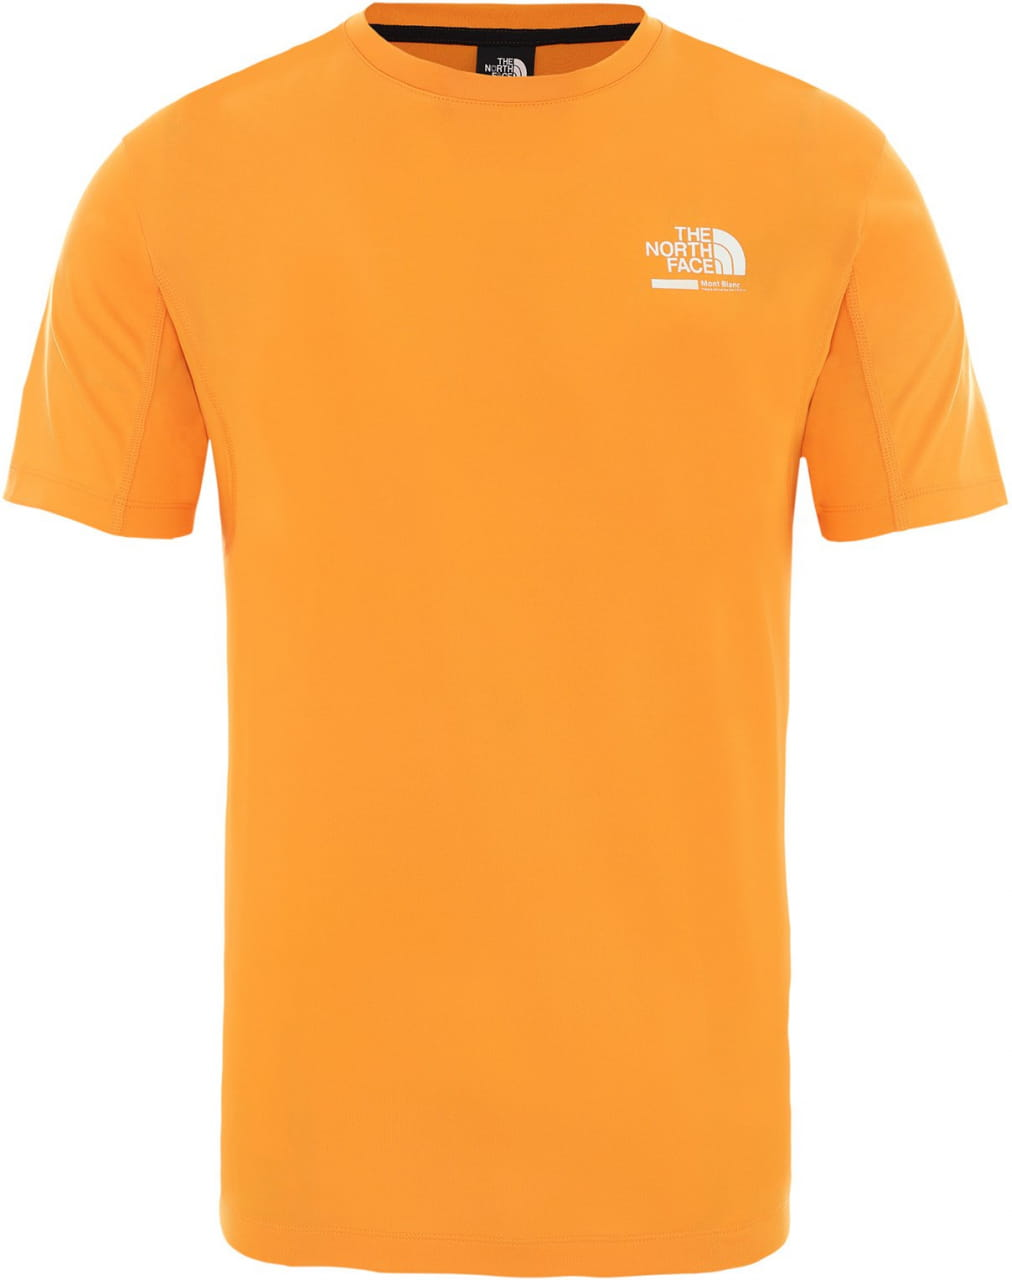 T-Shirts The North Face Men's Glacier T-Shirt